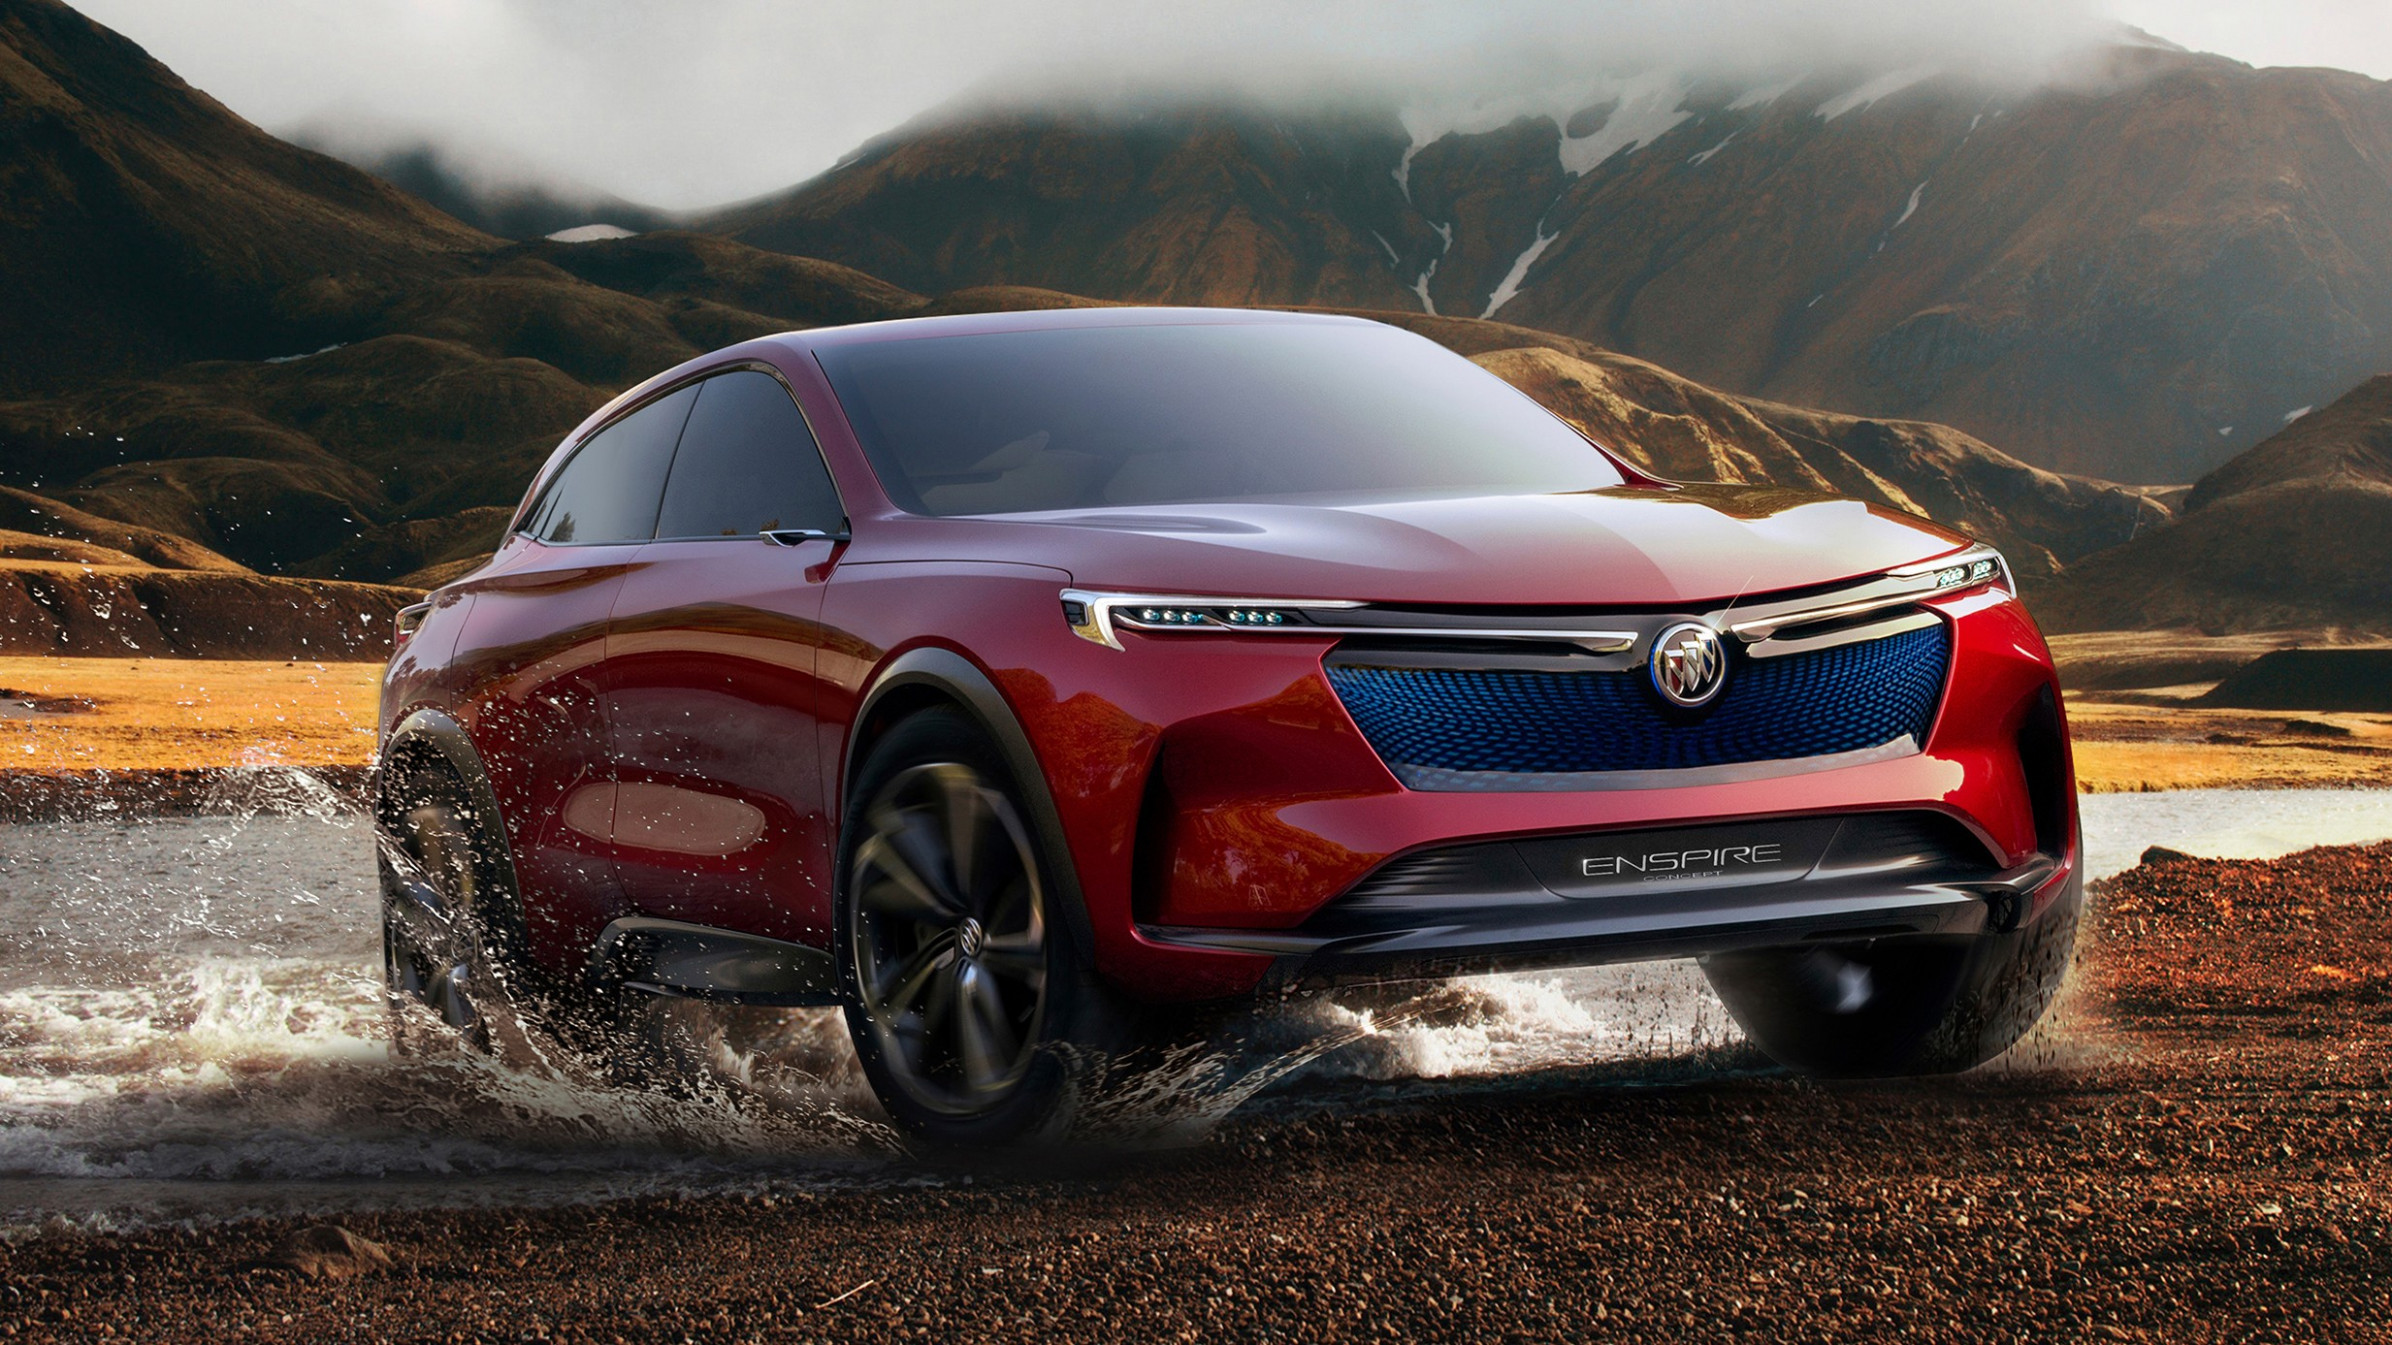 Prices 2022 Buick Enspire